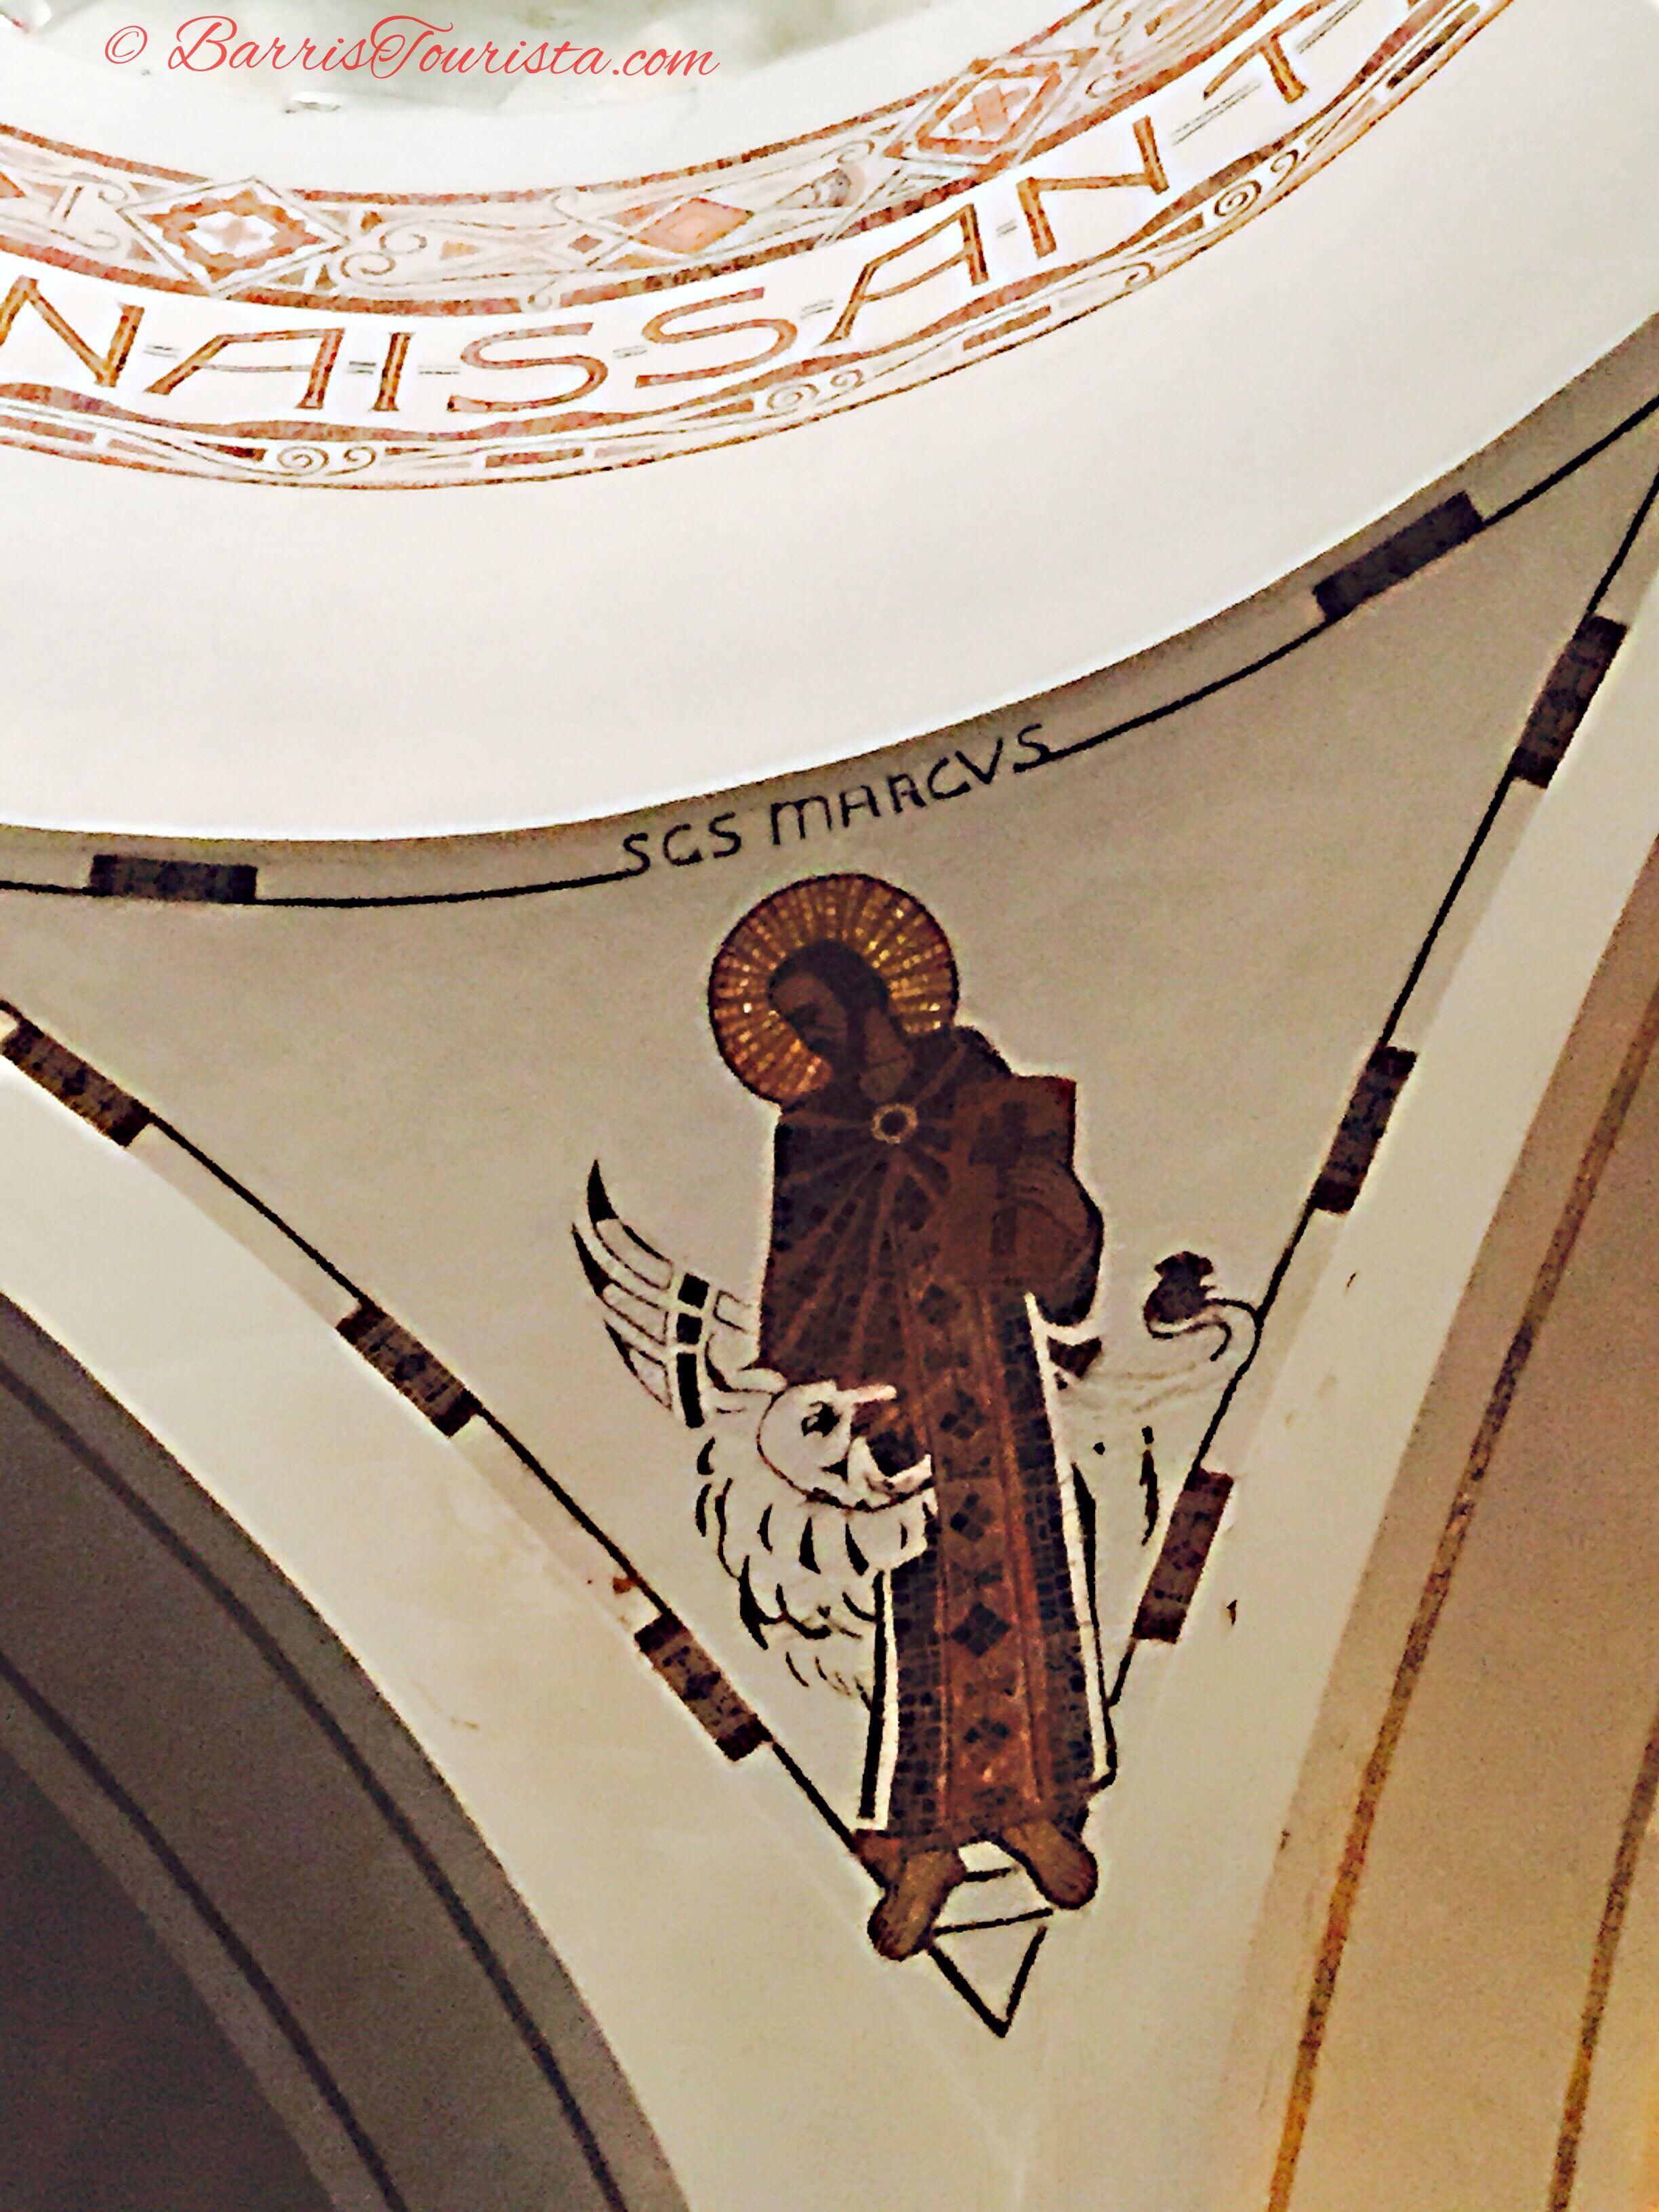 Barristourista-Sacred Heart Inside 3 karambole tours